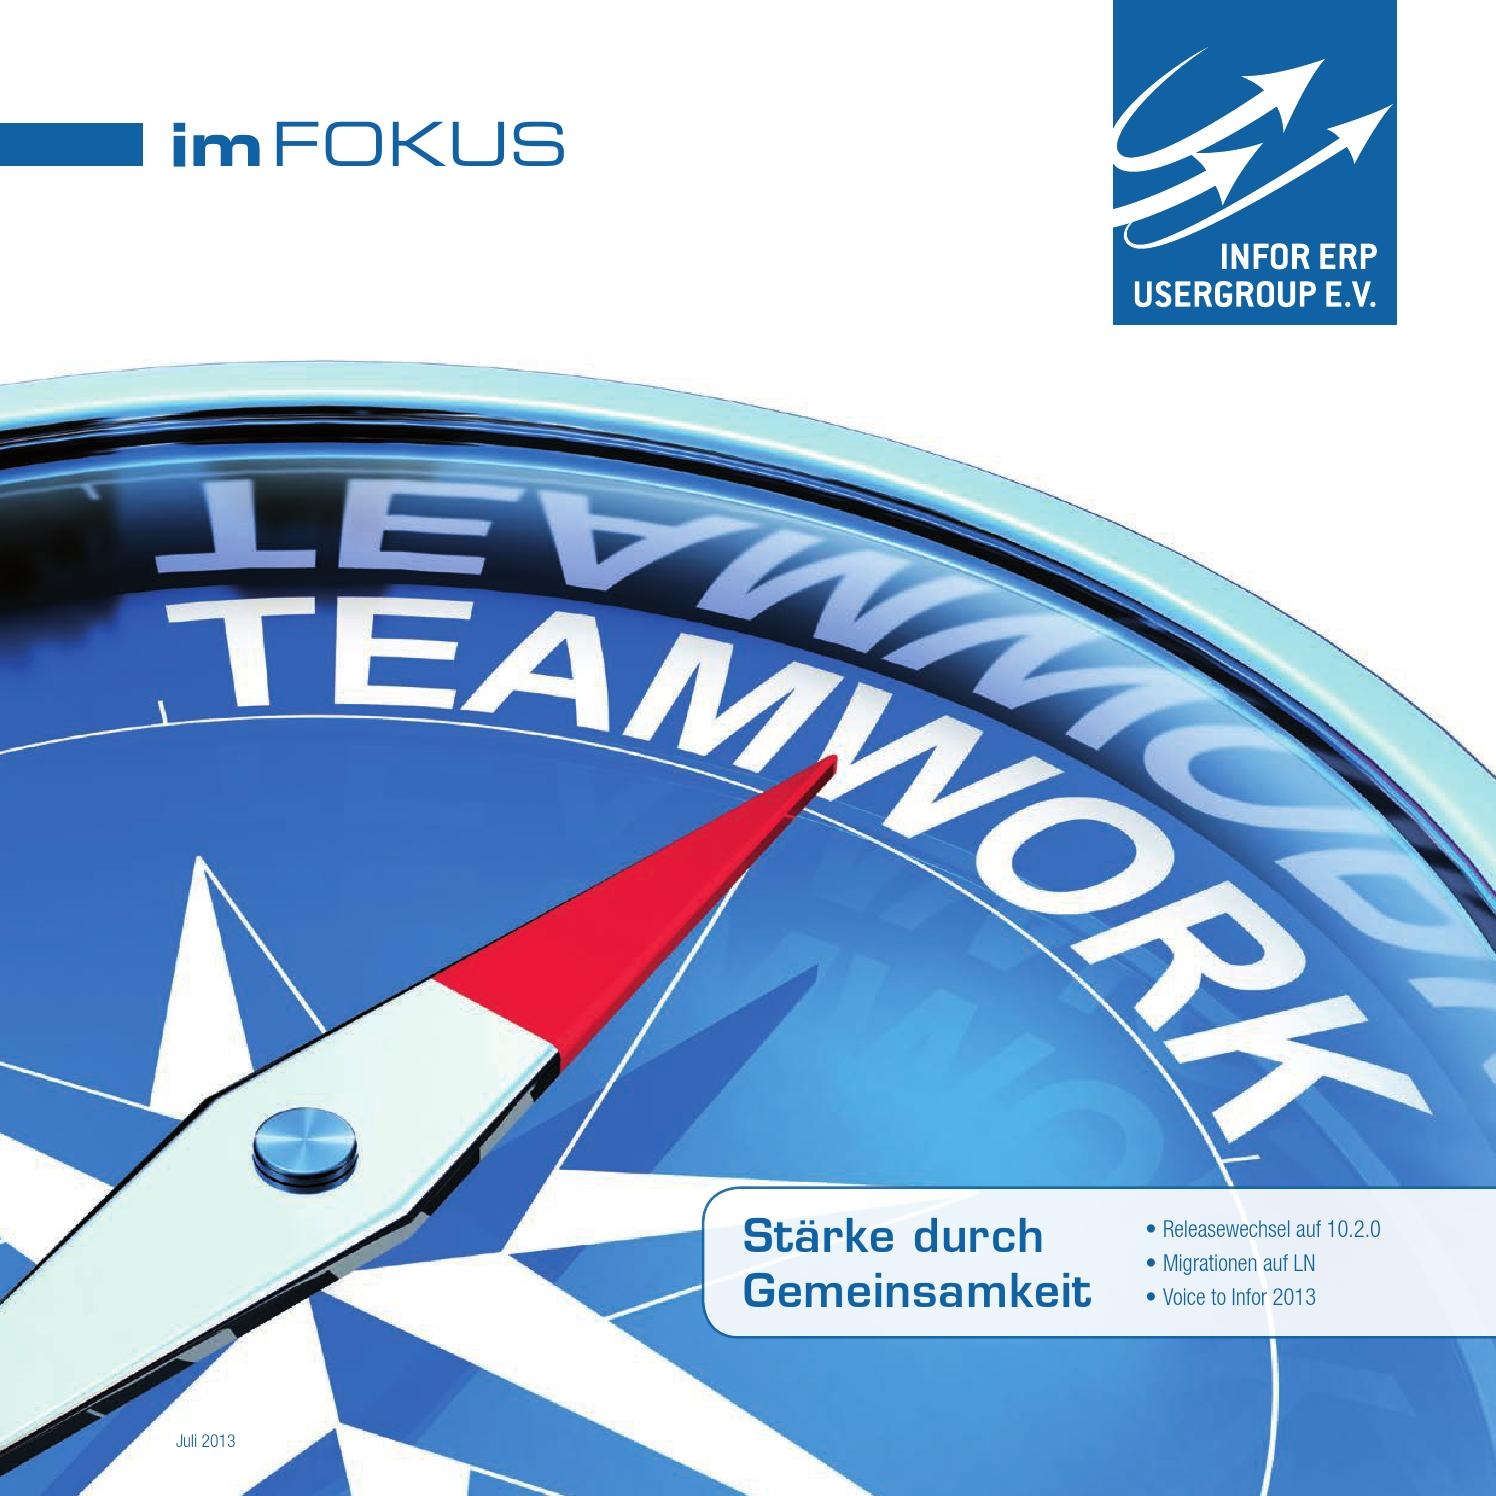 Iug mitgliederzeitung 2013 web by Infor ERP Usergroup e.V. - issuu